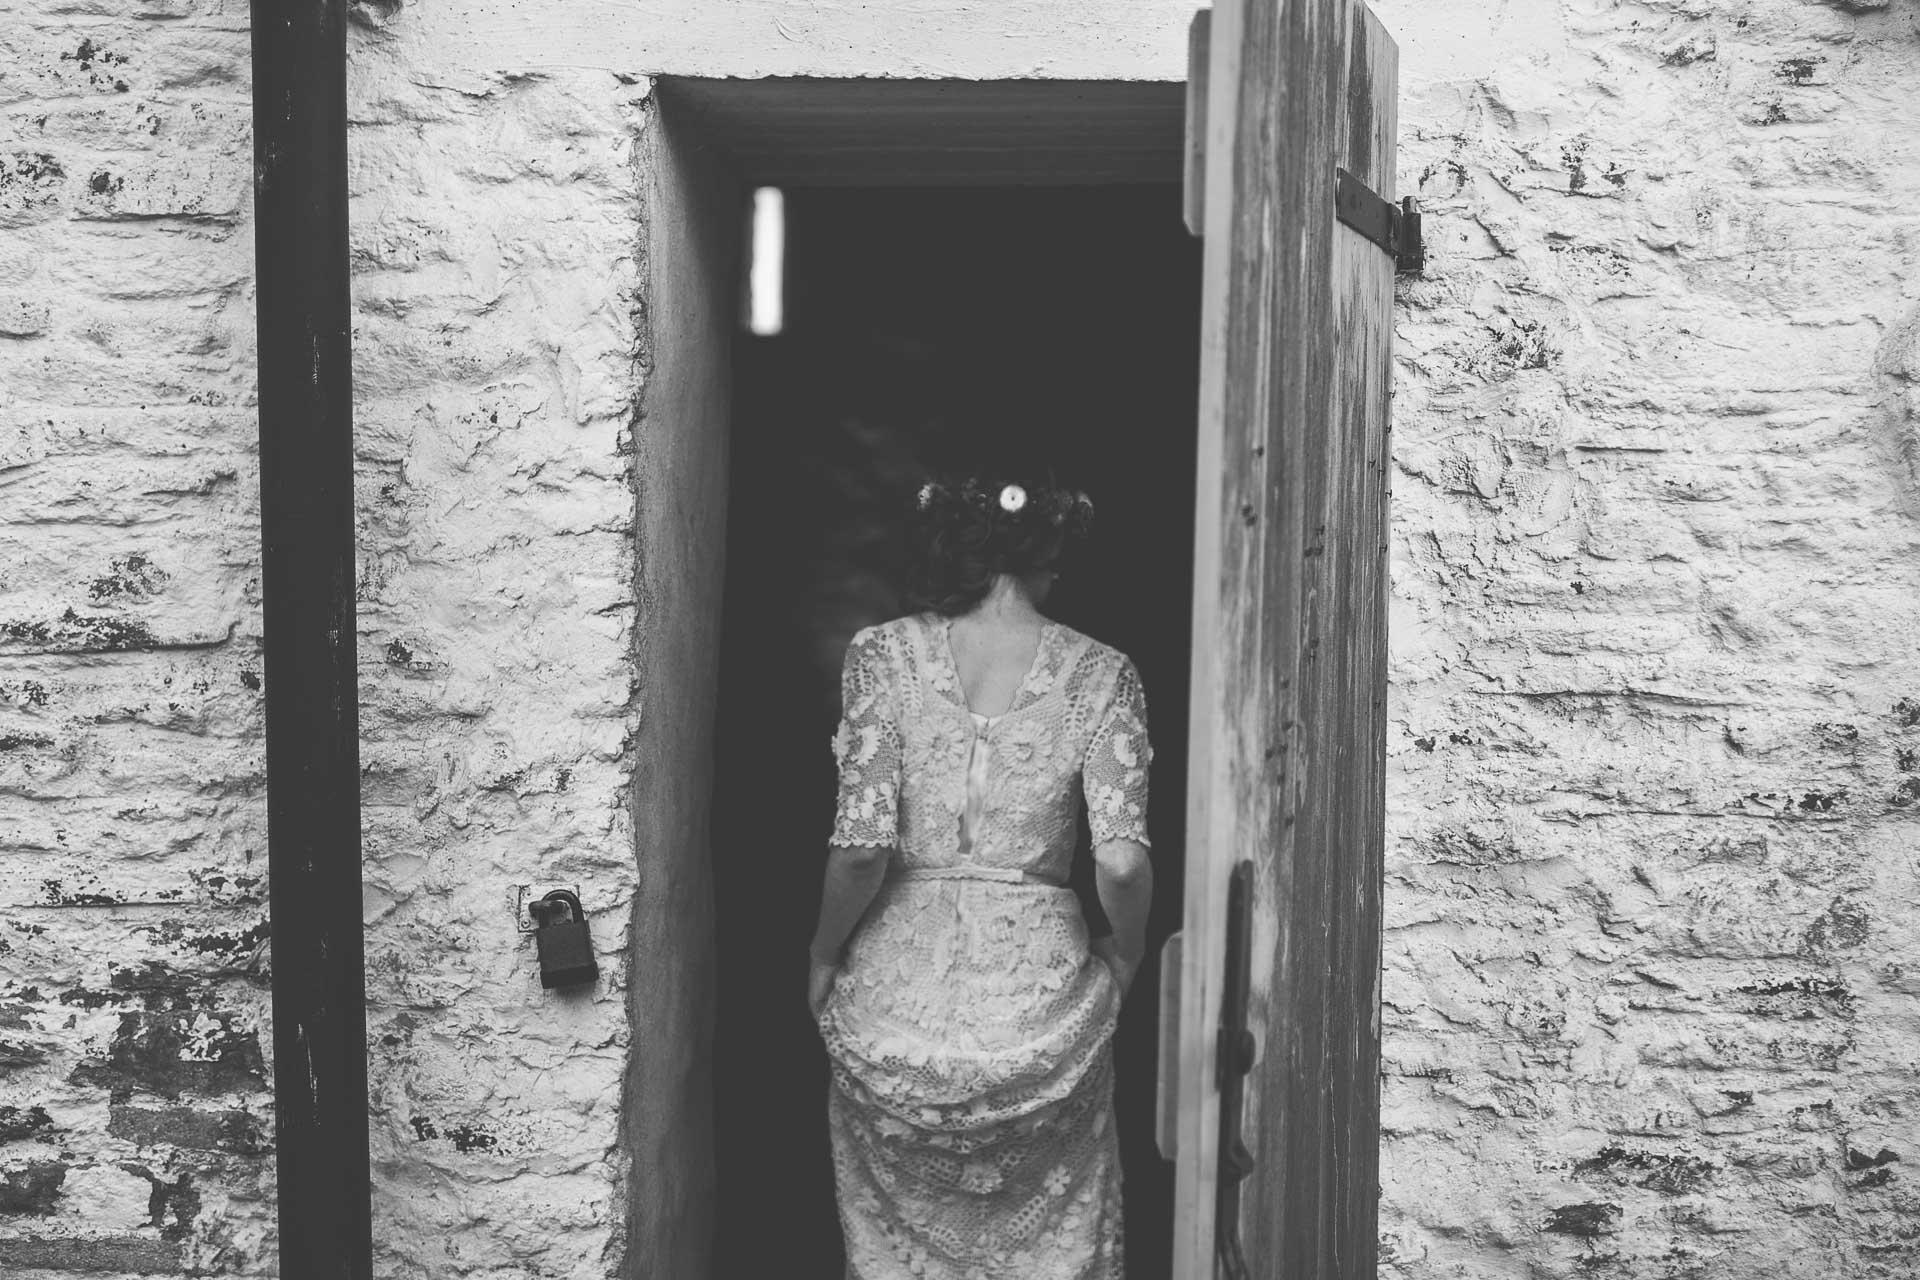 winterbourne-medieval-barn-wedding-photography-emma-andrew-91